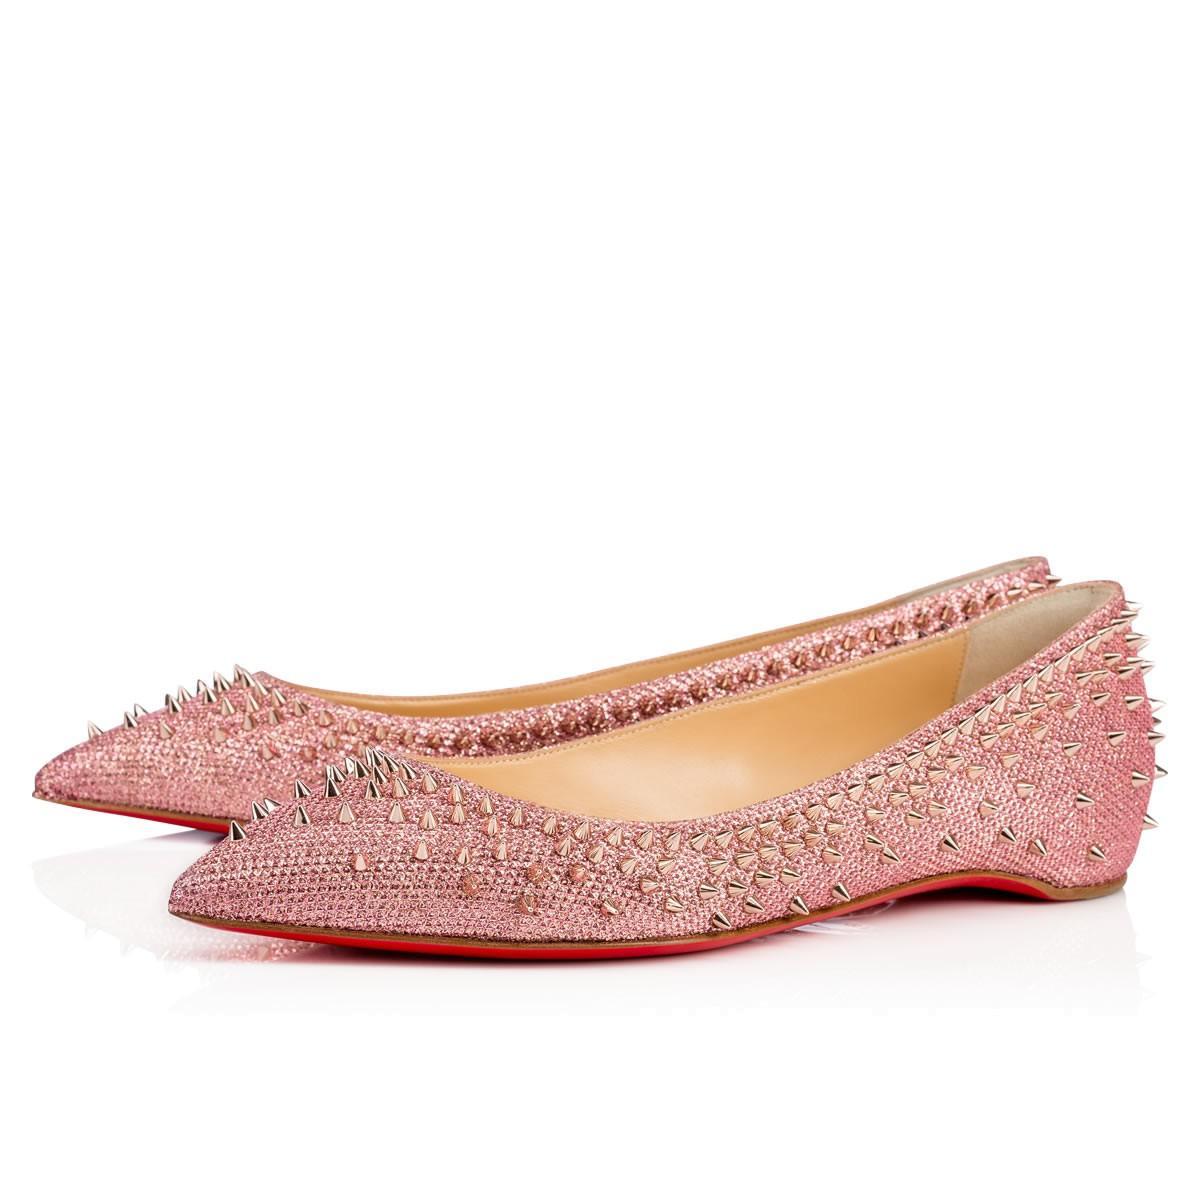 nouveau style 0c5c8 0aa1e Escarpic Flat Poudre/Pink Bronze Glitter - Women Shoes - Christian Louboutin